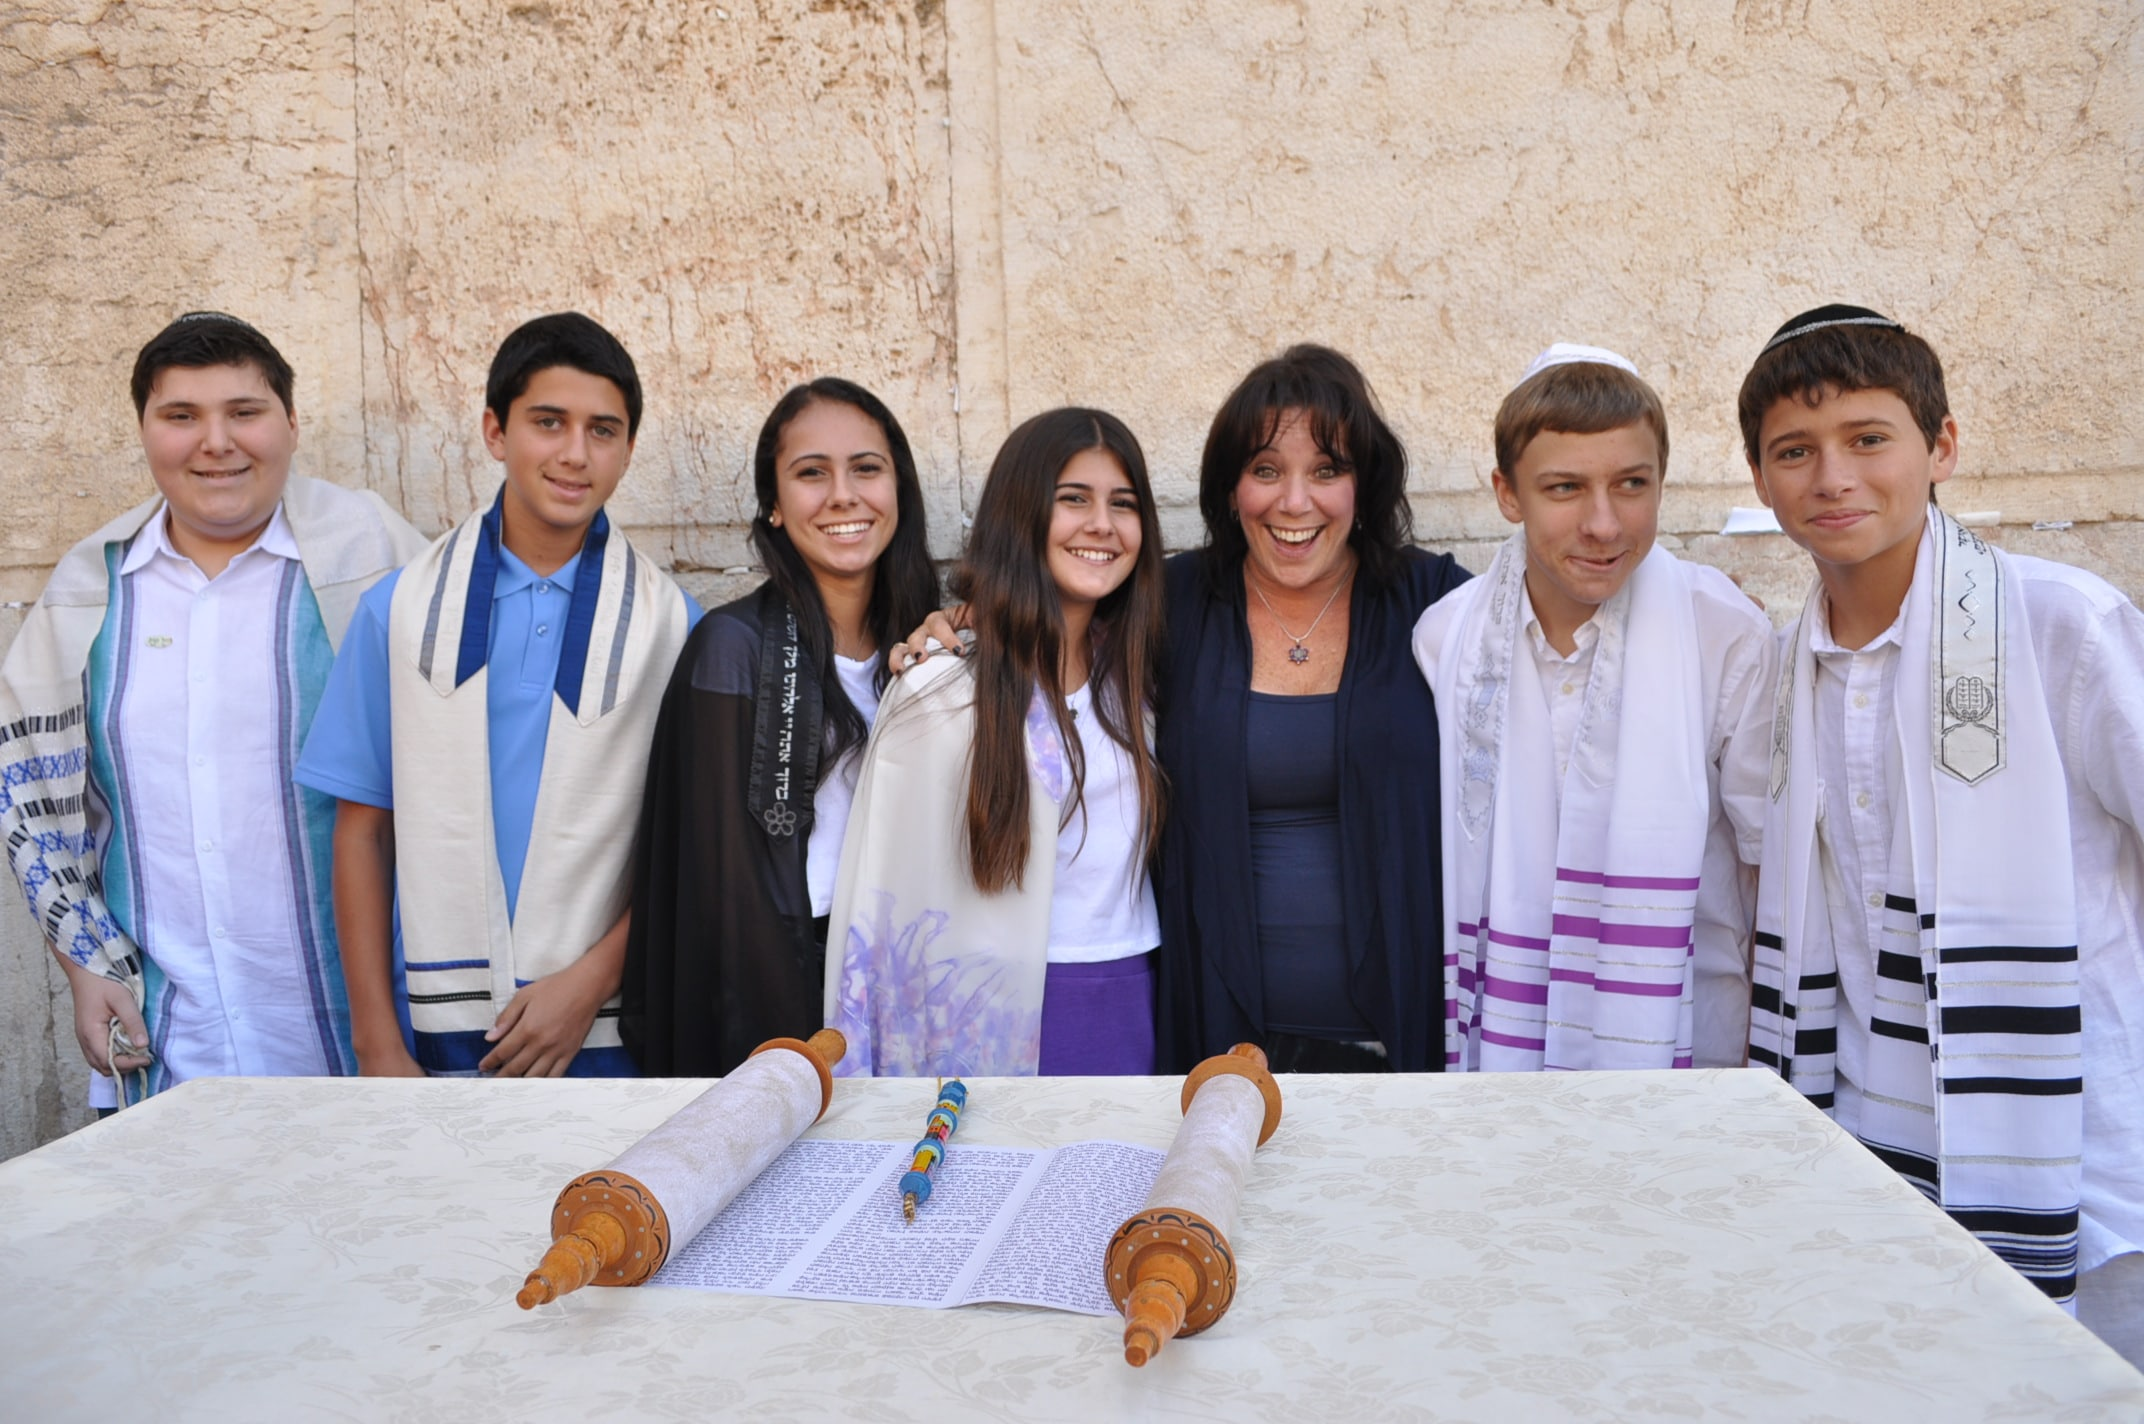 Israel B-Mitzvah with Cantor Debbi Ballard